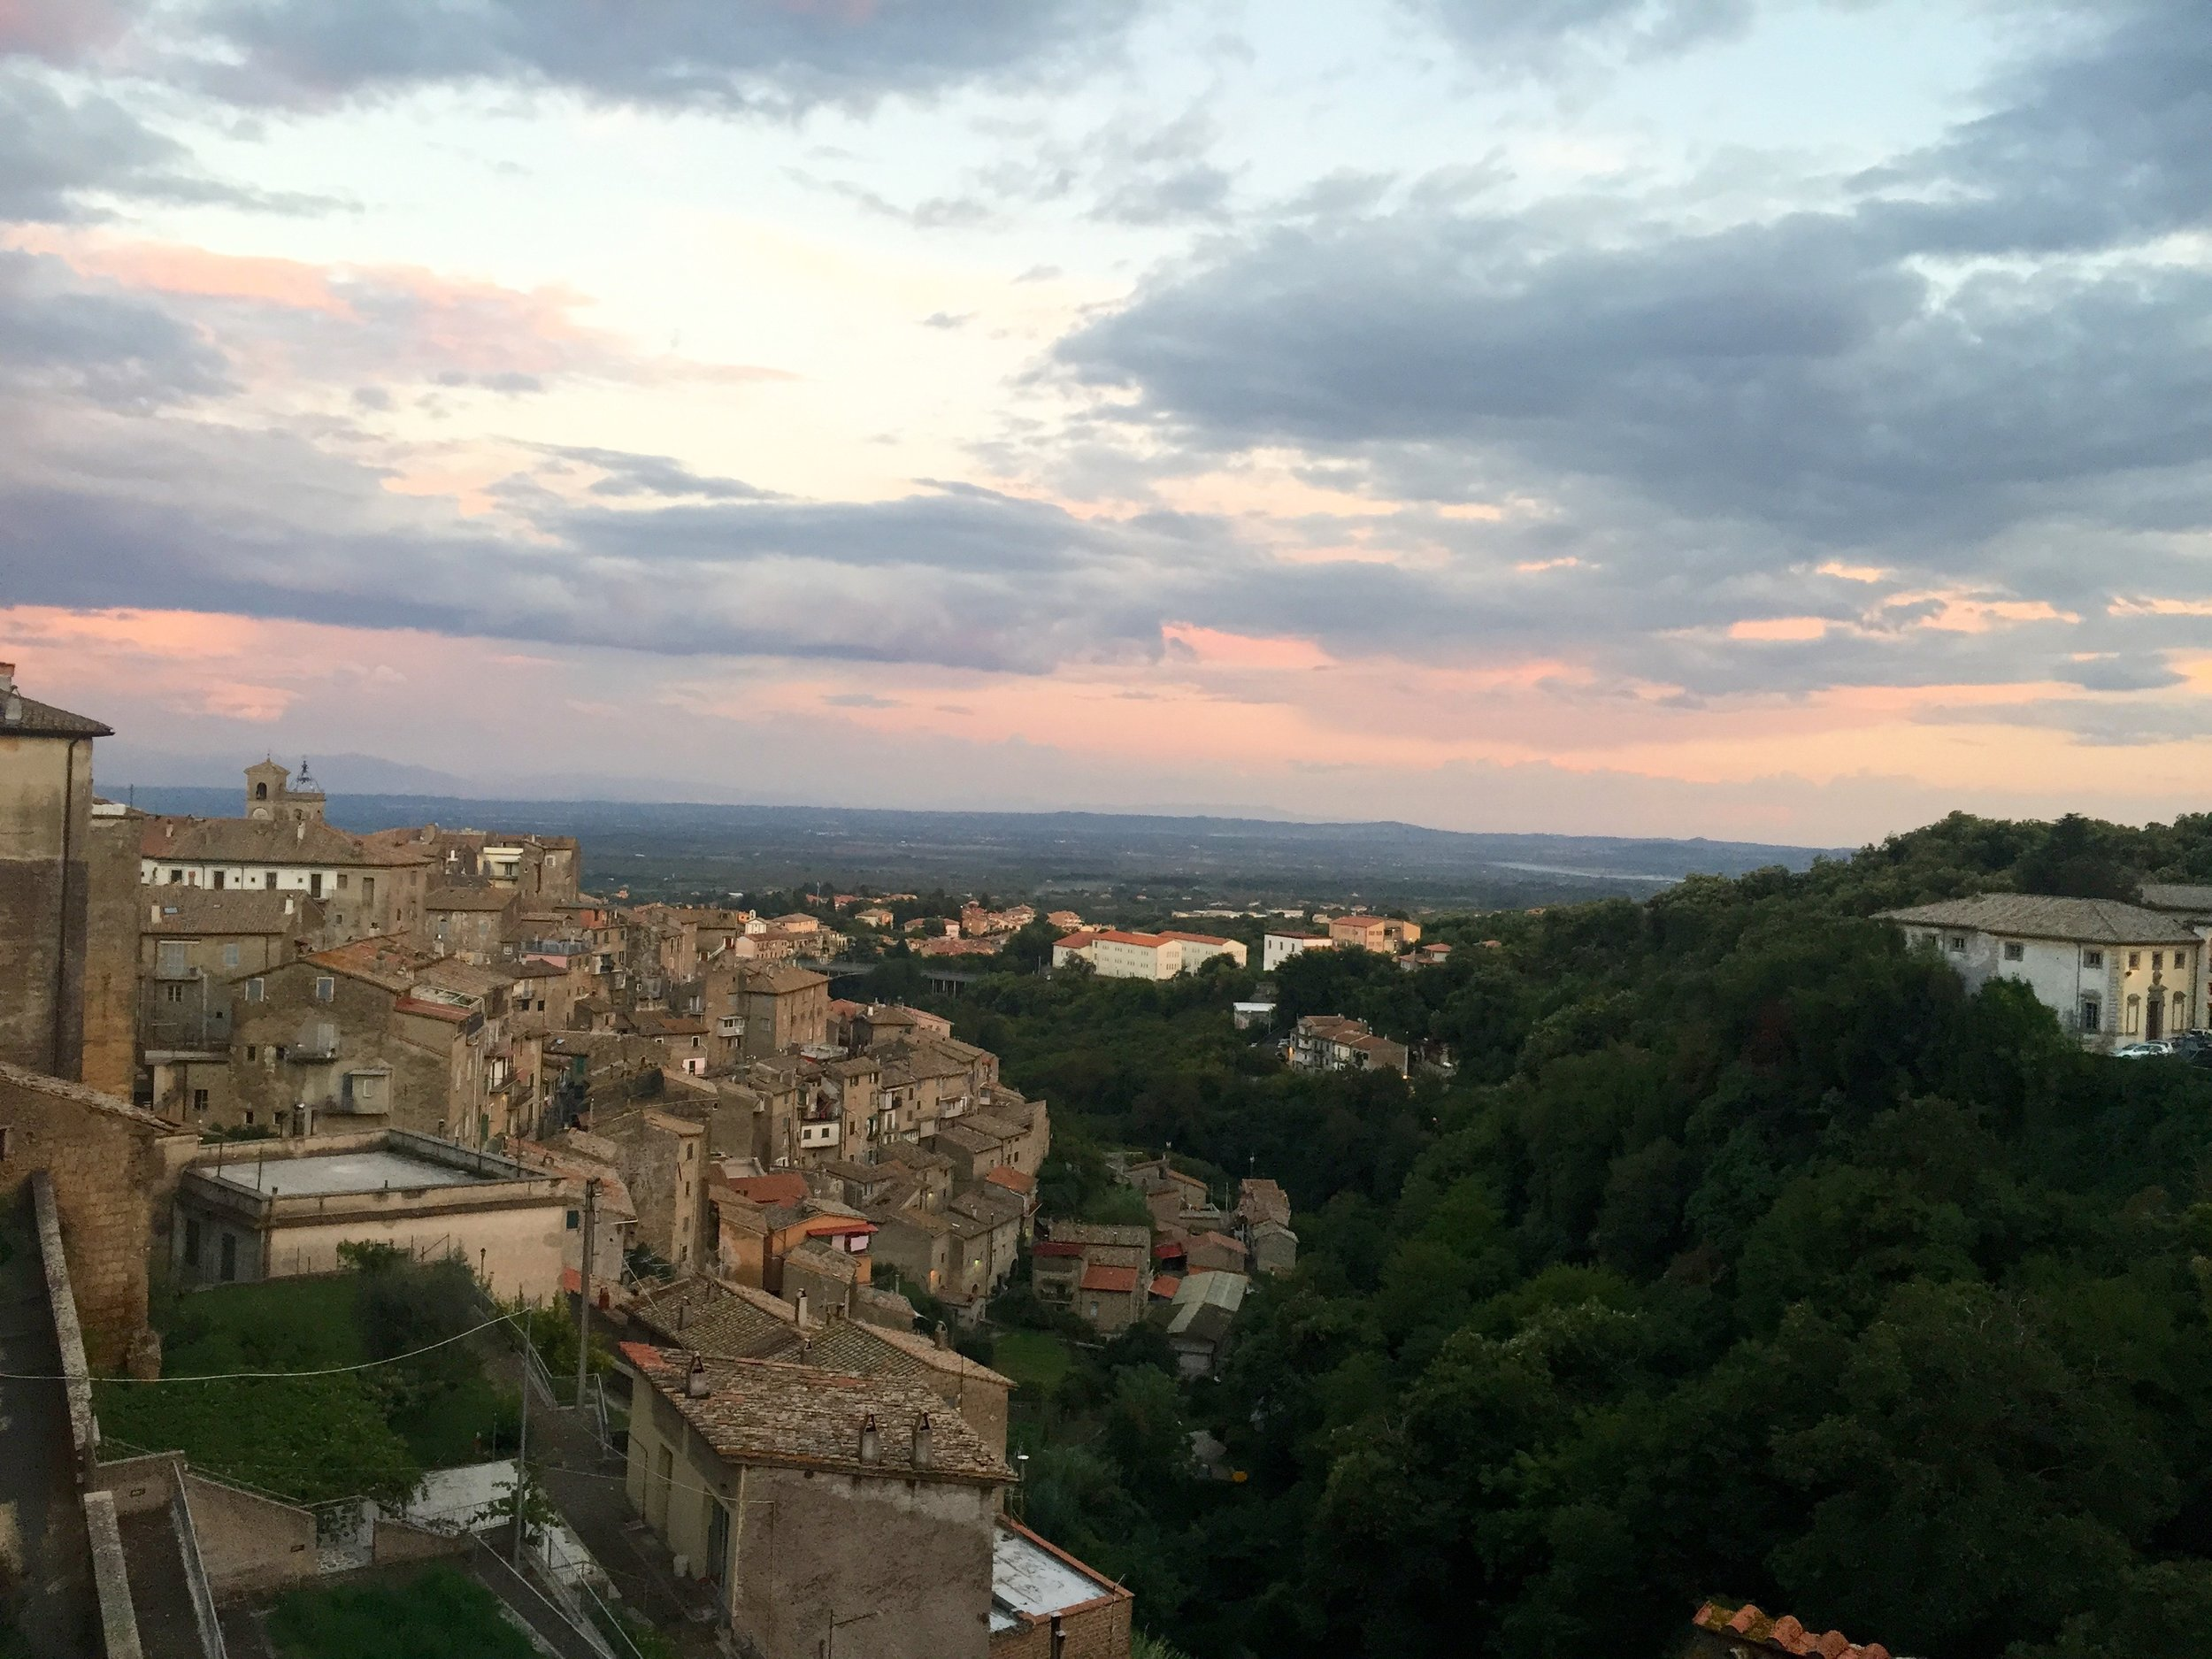 Caprarola, Italy